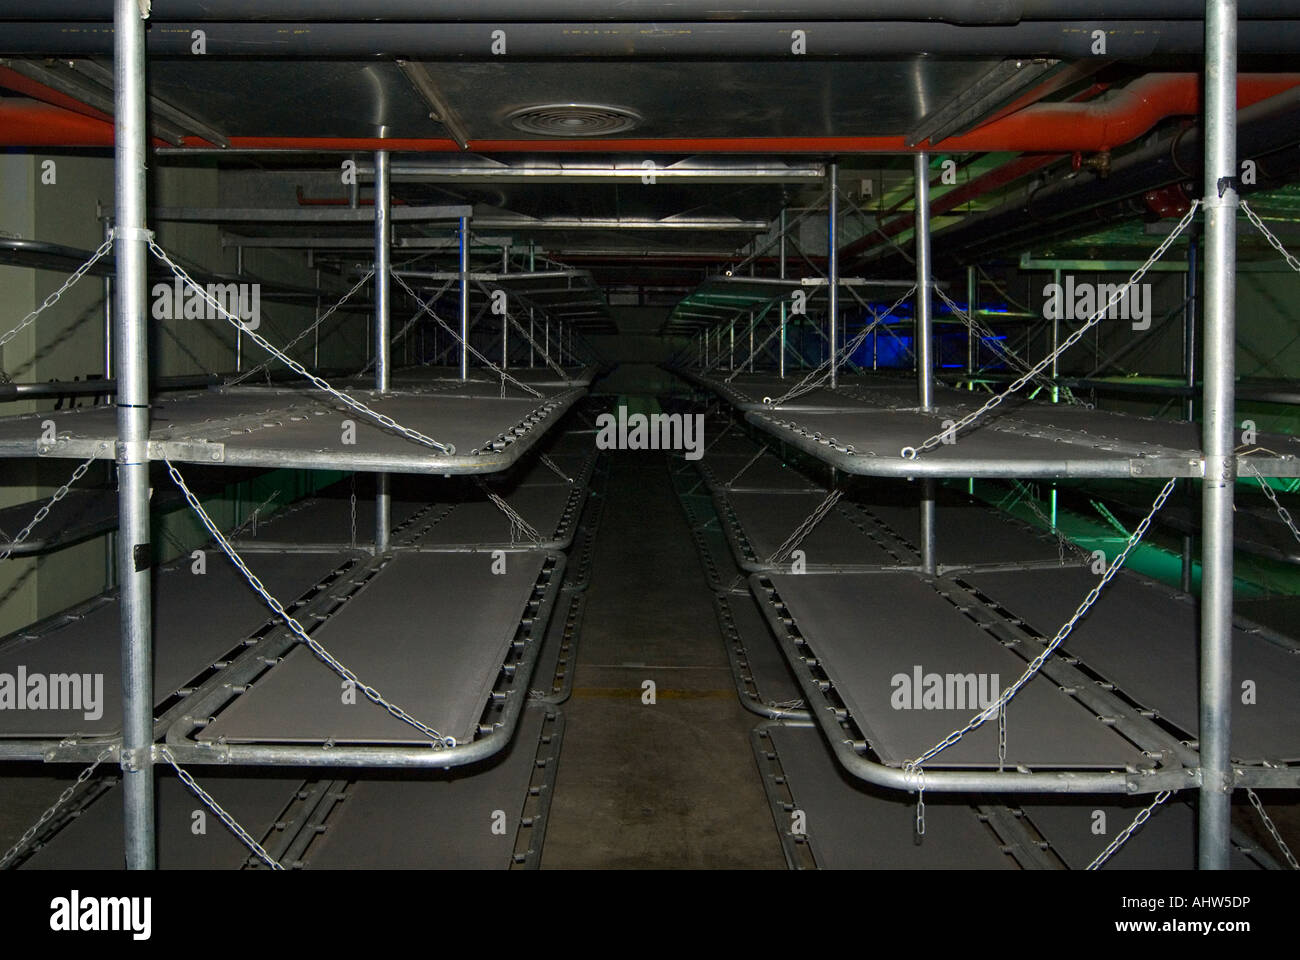 Etagenbetten Metall : Etagenbett metall doppelbett extra anfertigung kilo in bayern